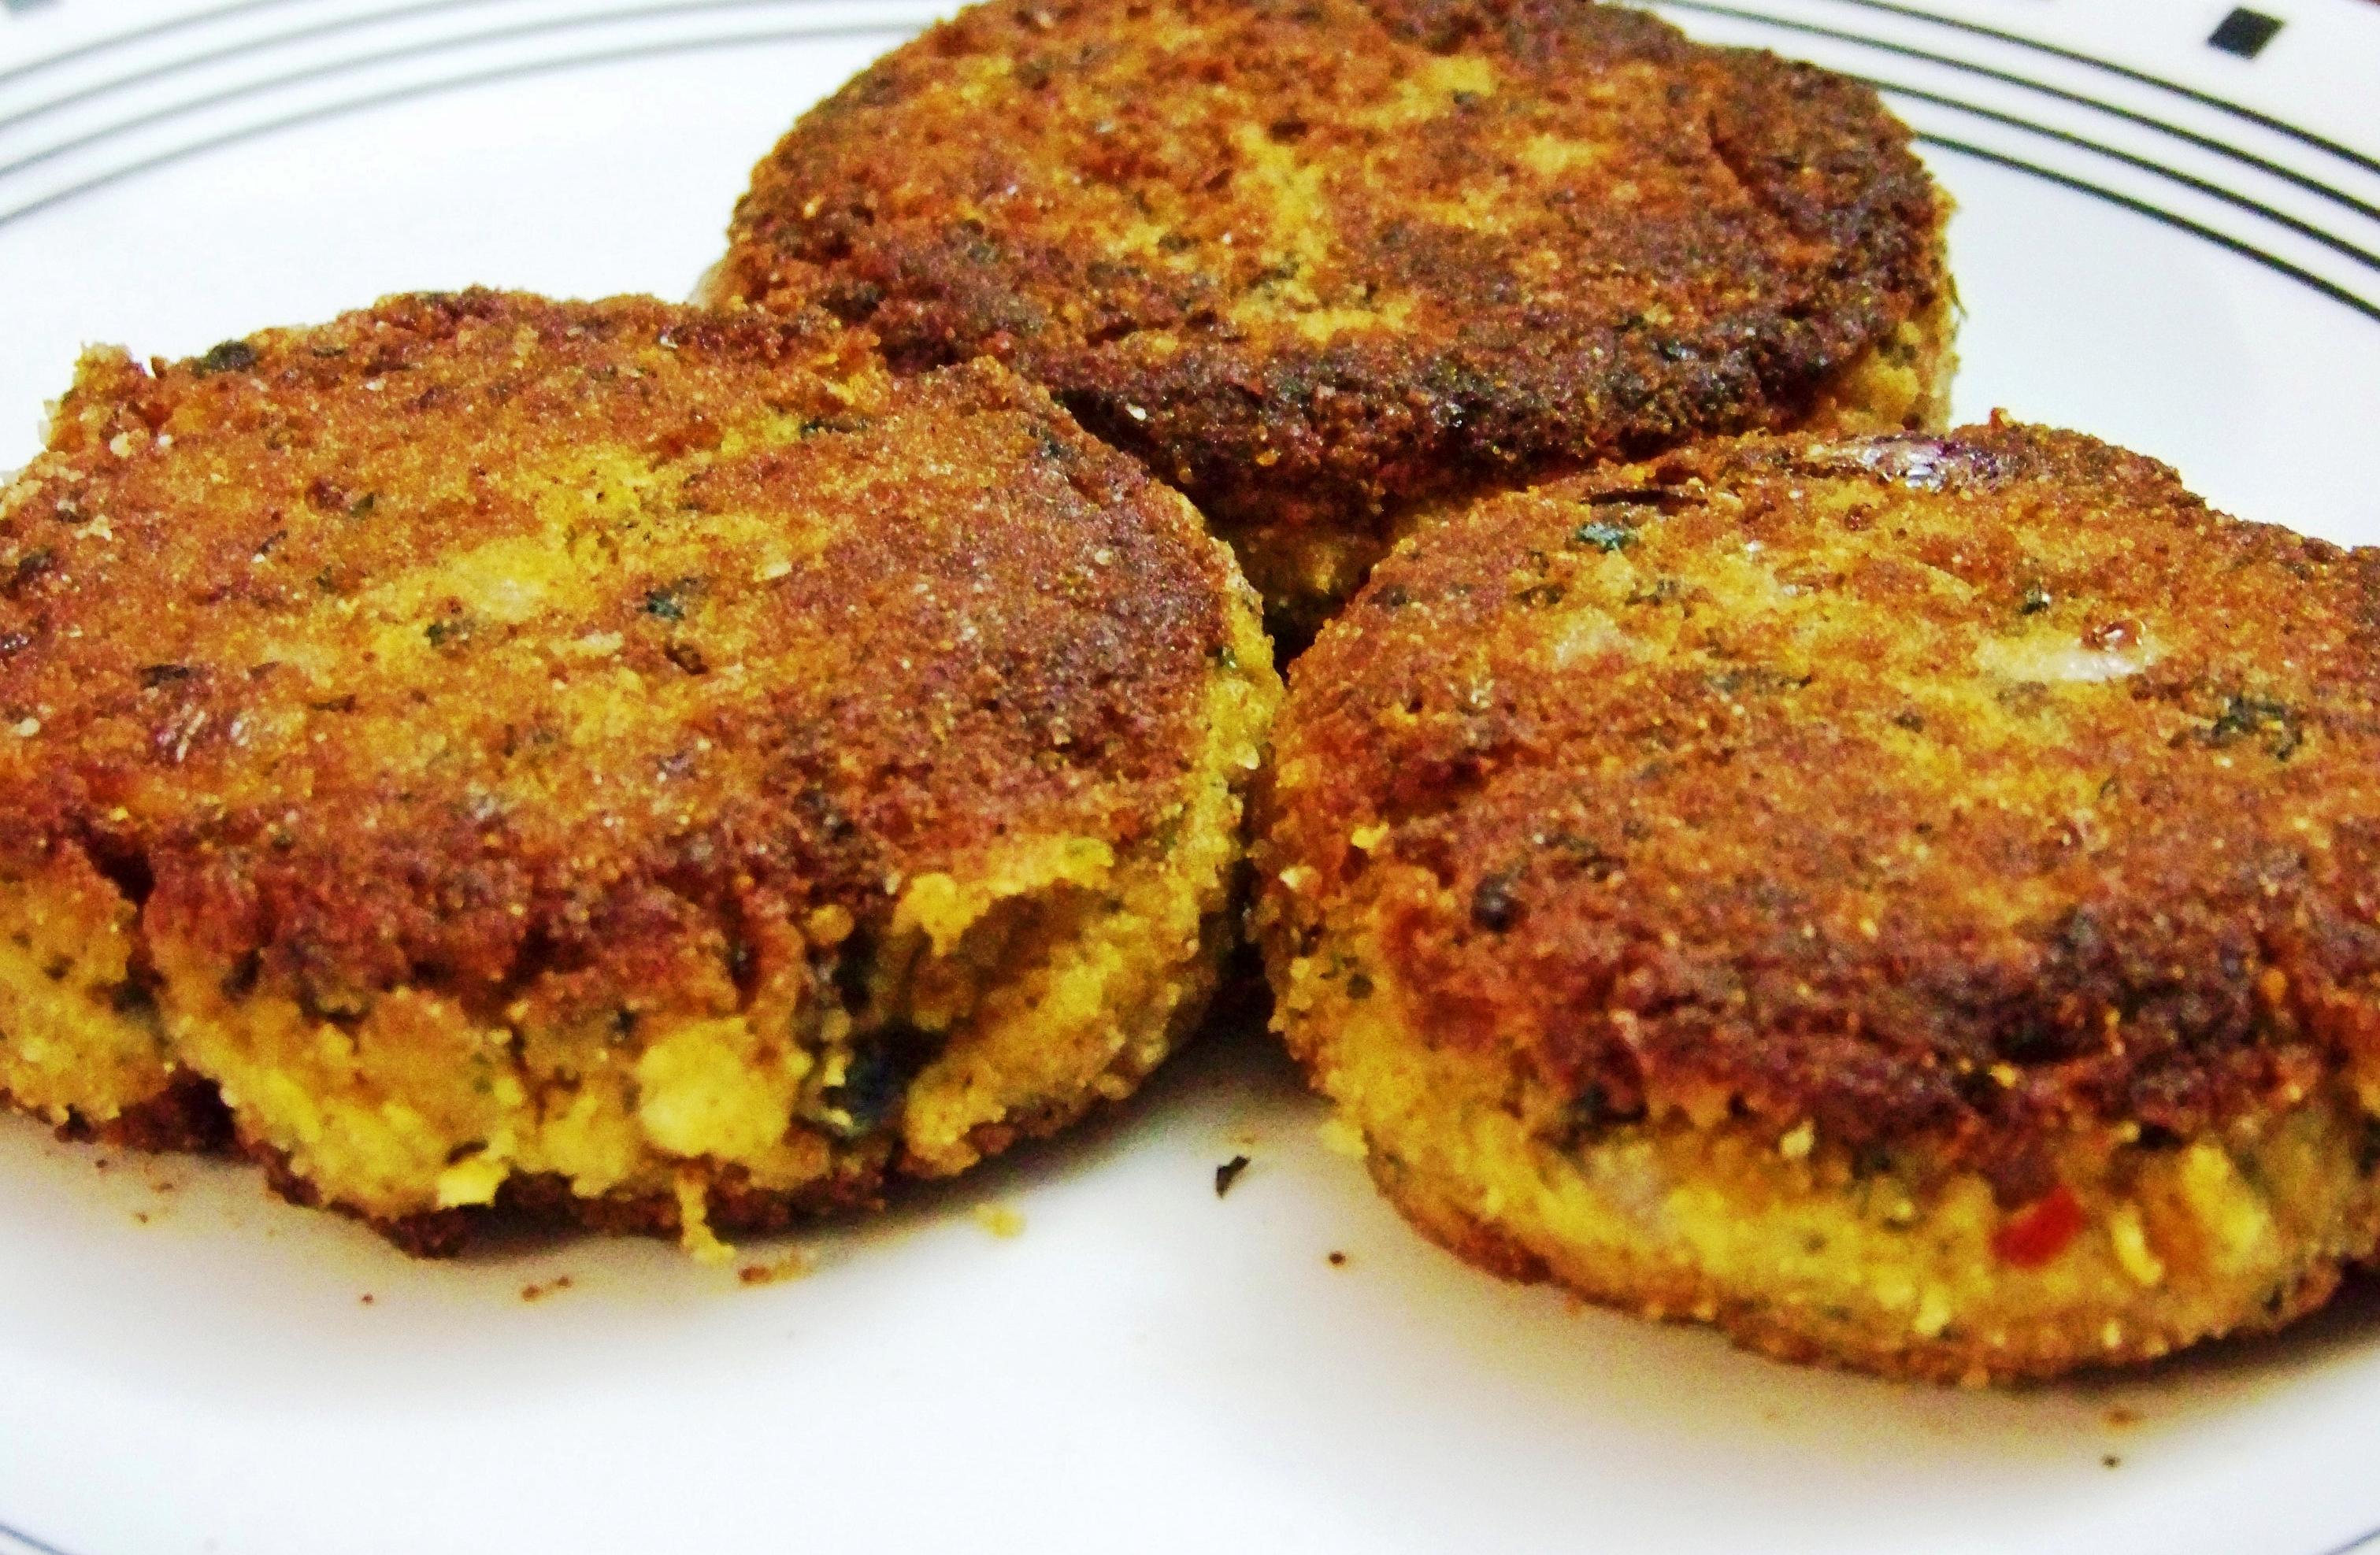 Healthy Gluten Free Recipes Vegan Spicy Tofu Burger